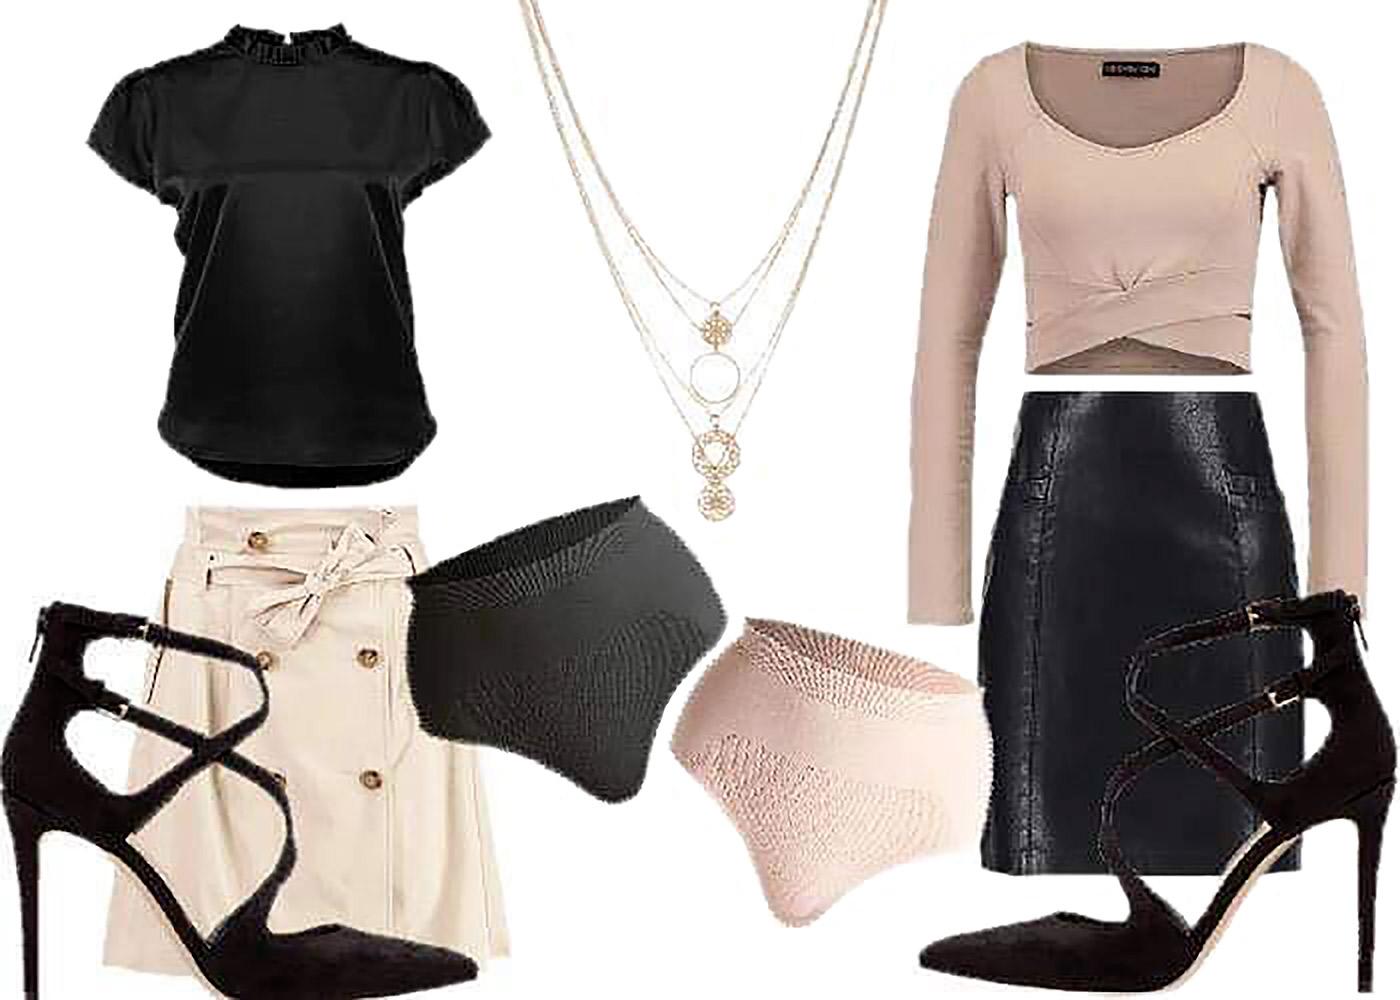 outfit perizoma begood